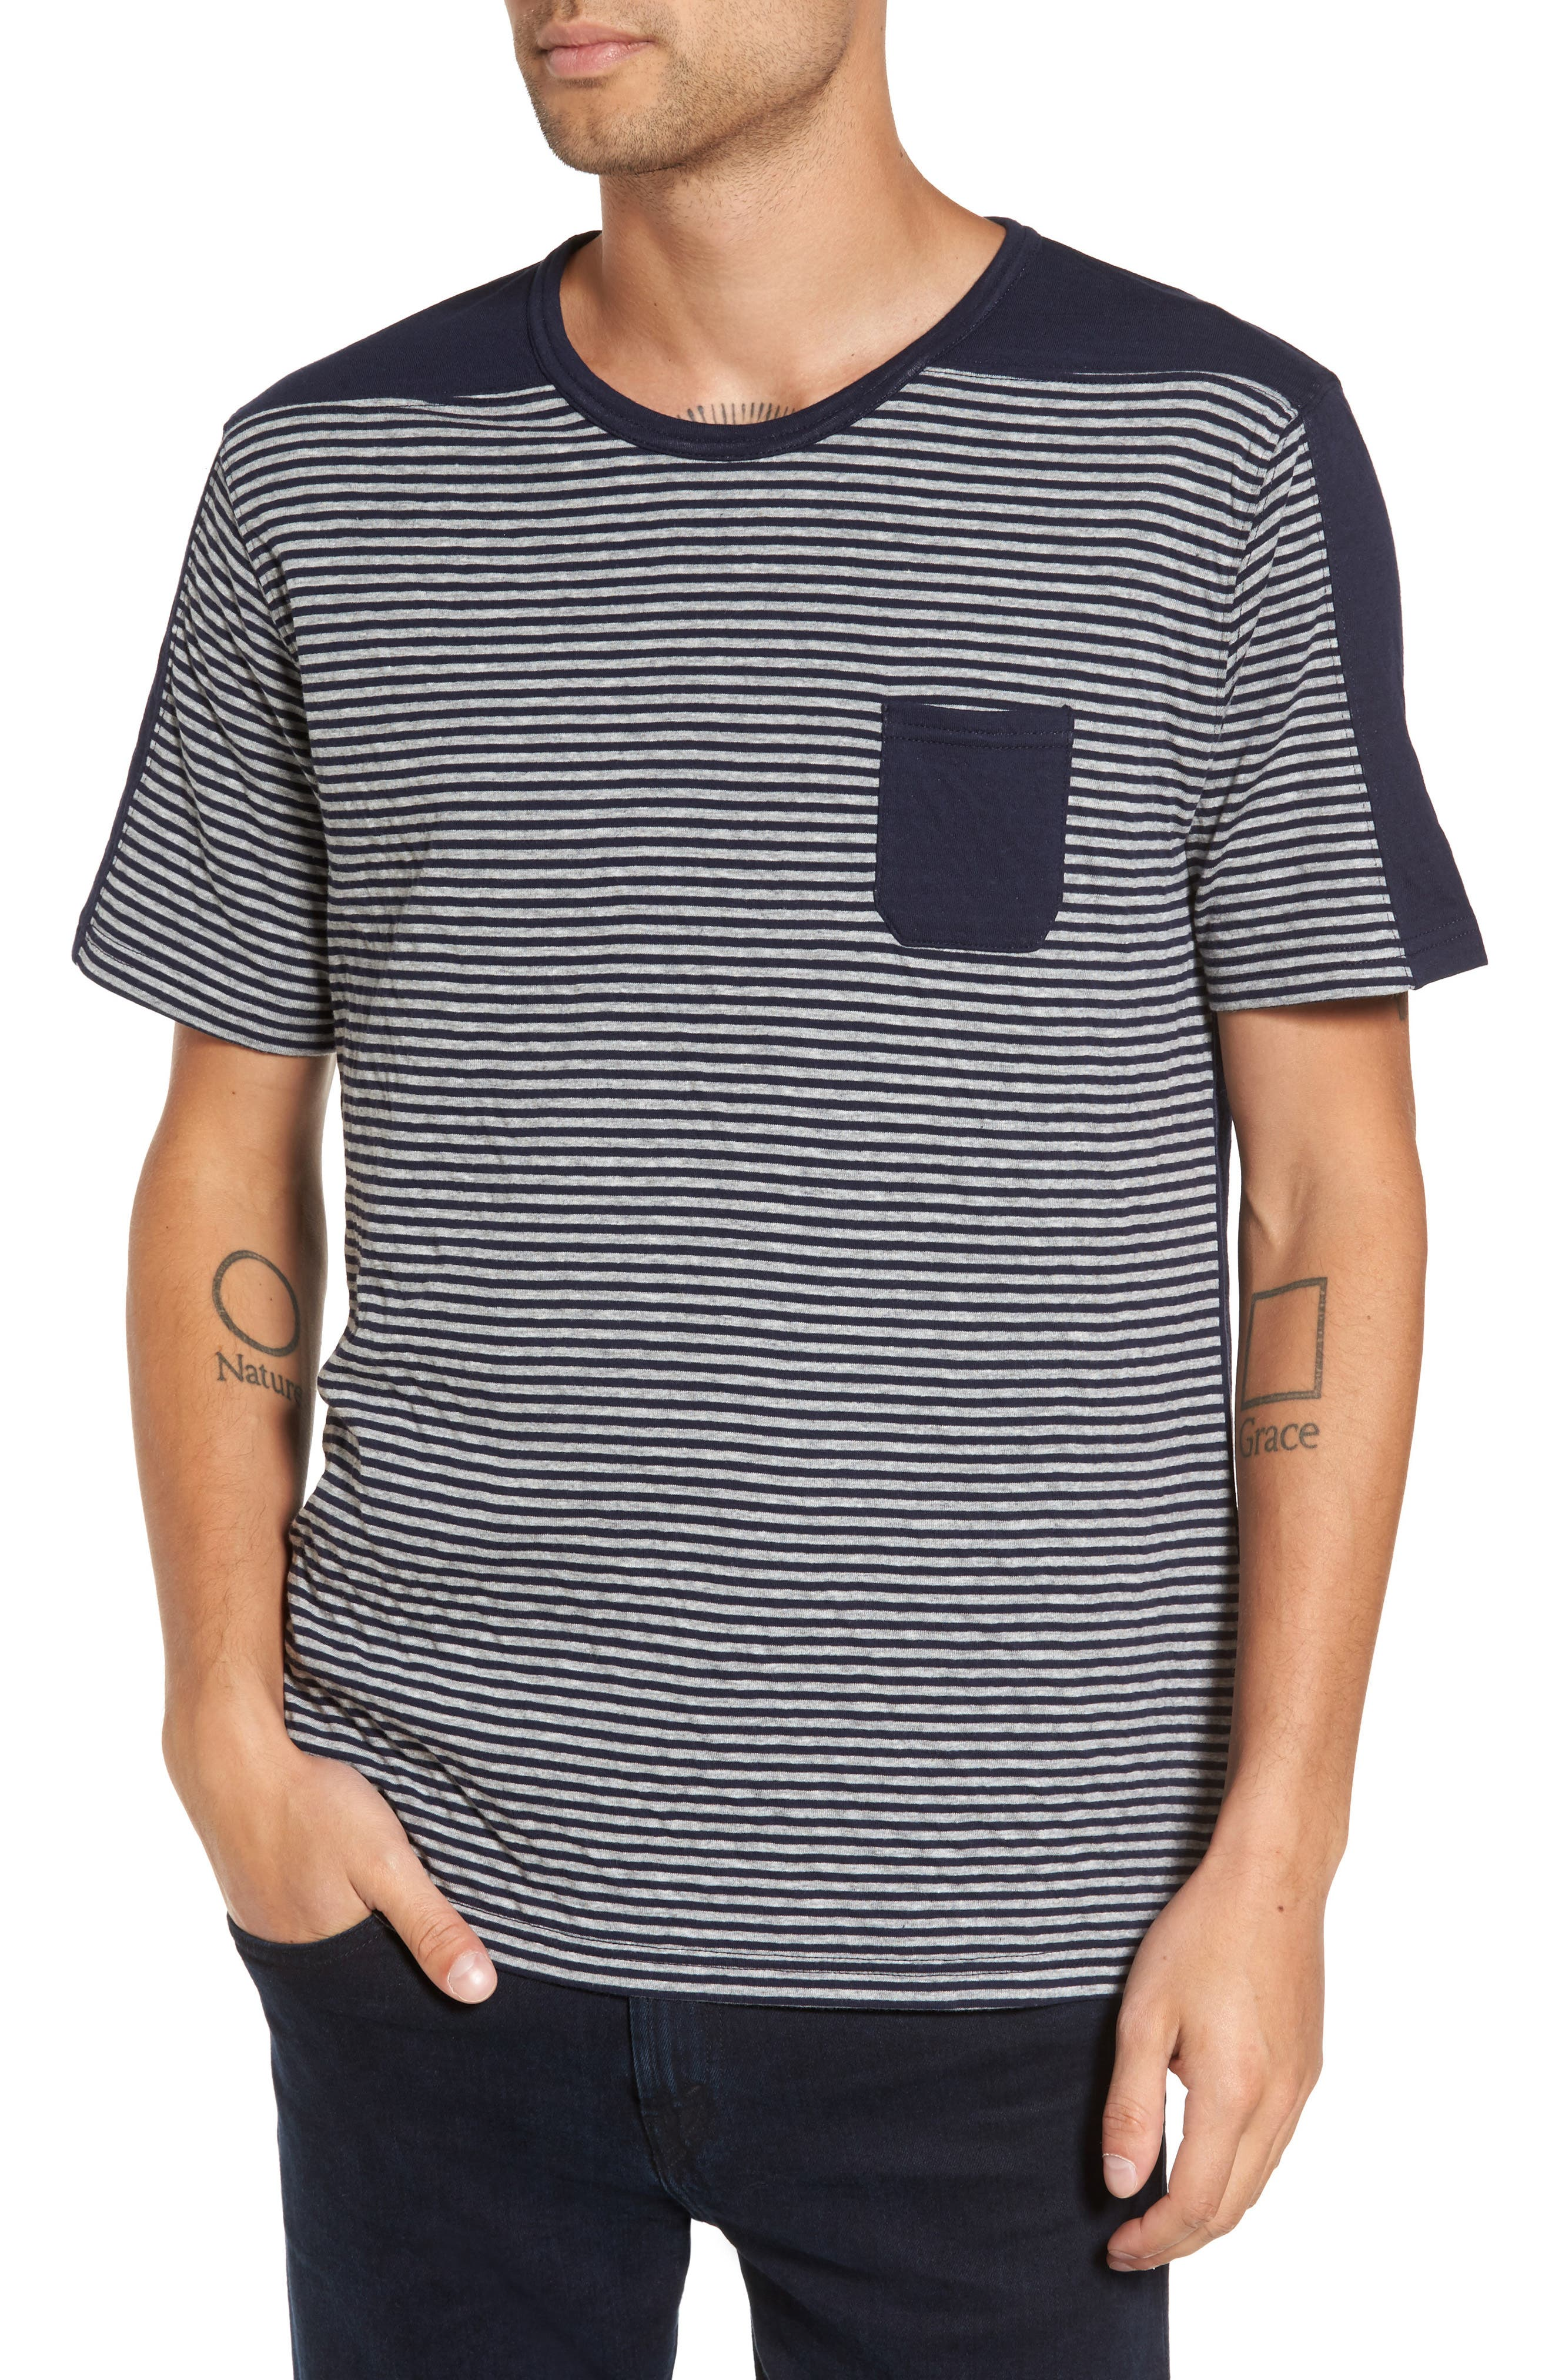 Main Image - Slate & Stone Striped Pocket T-Shirt